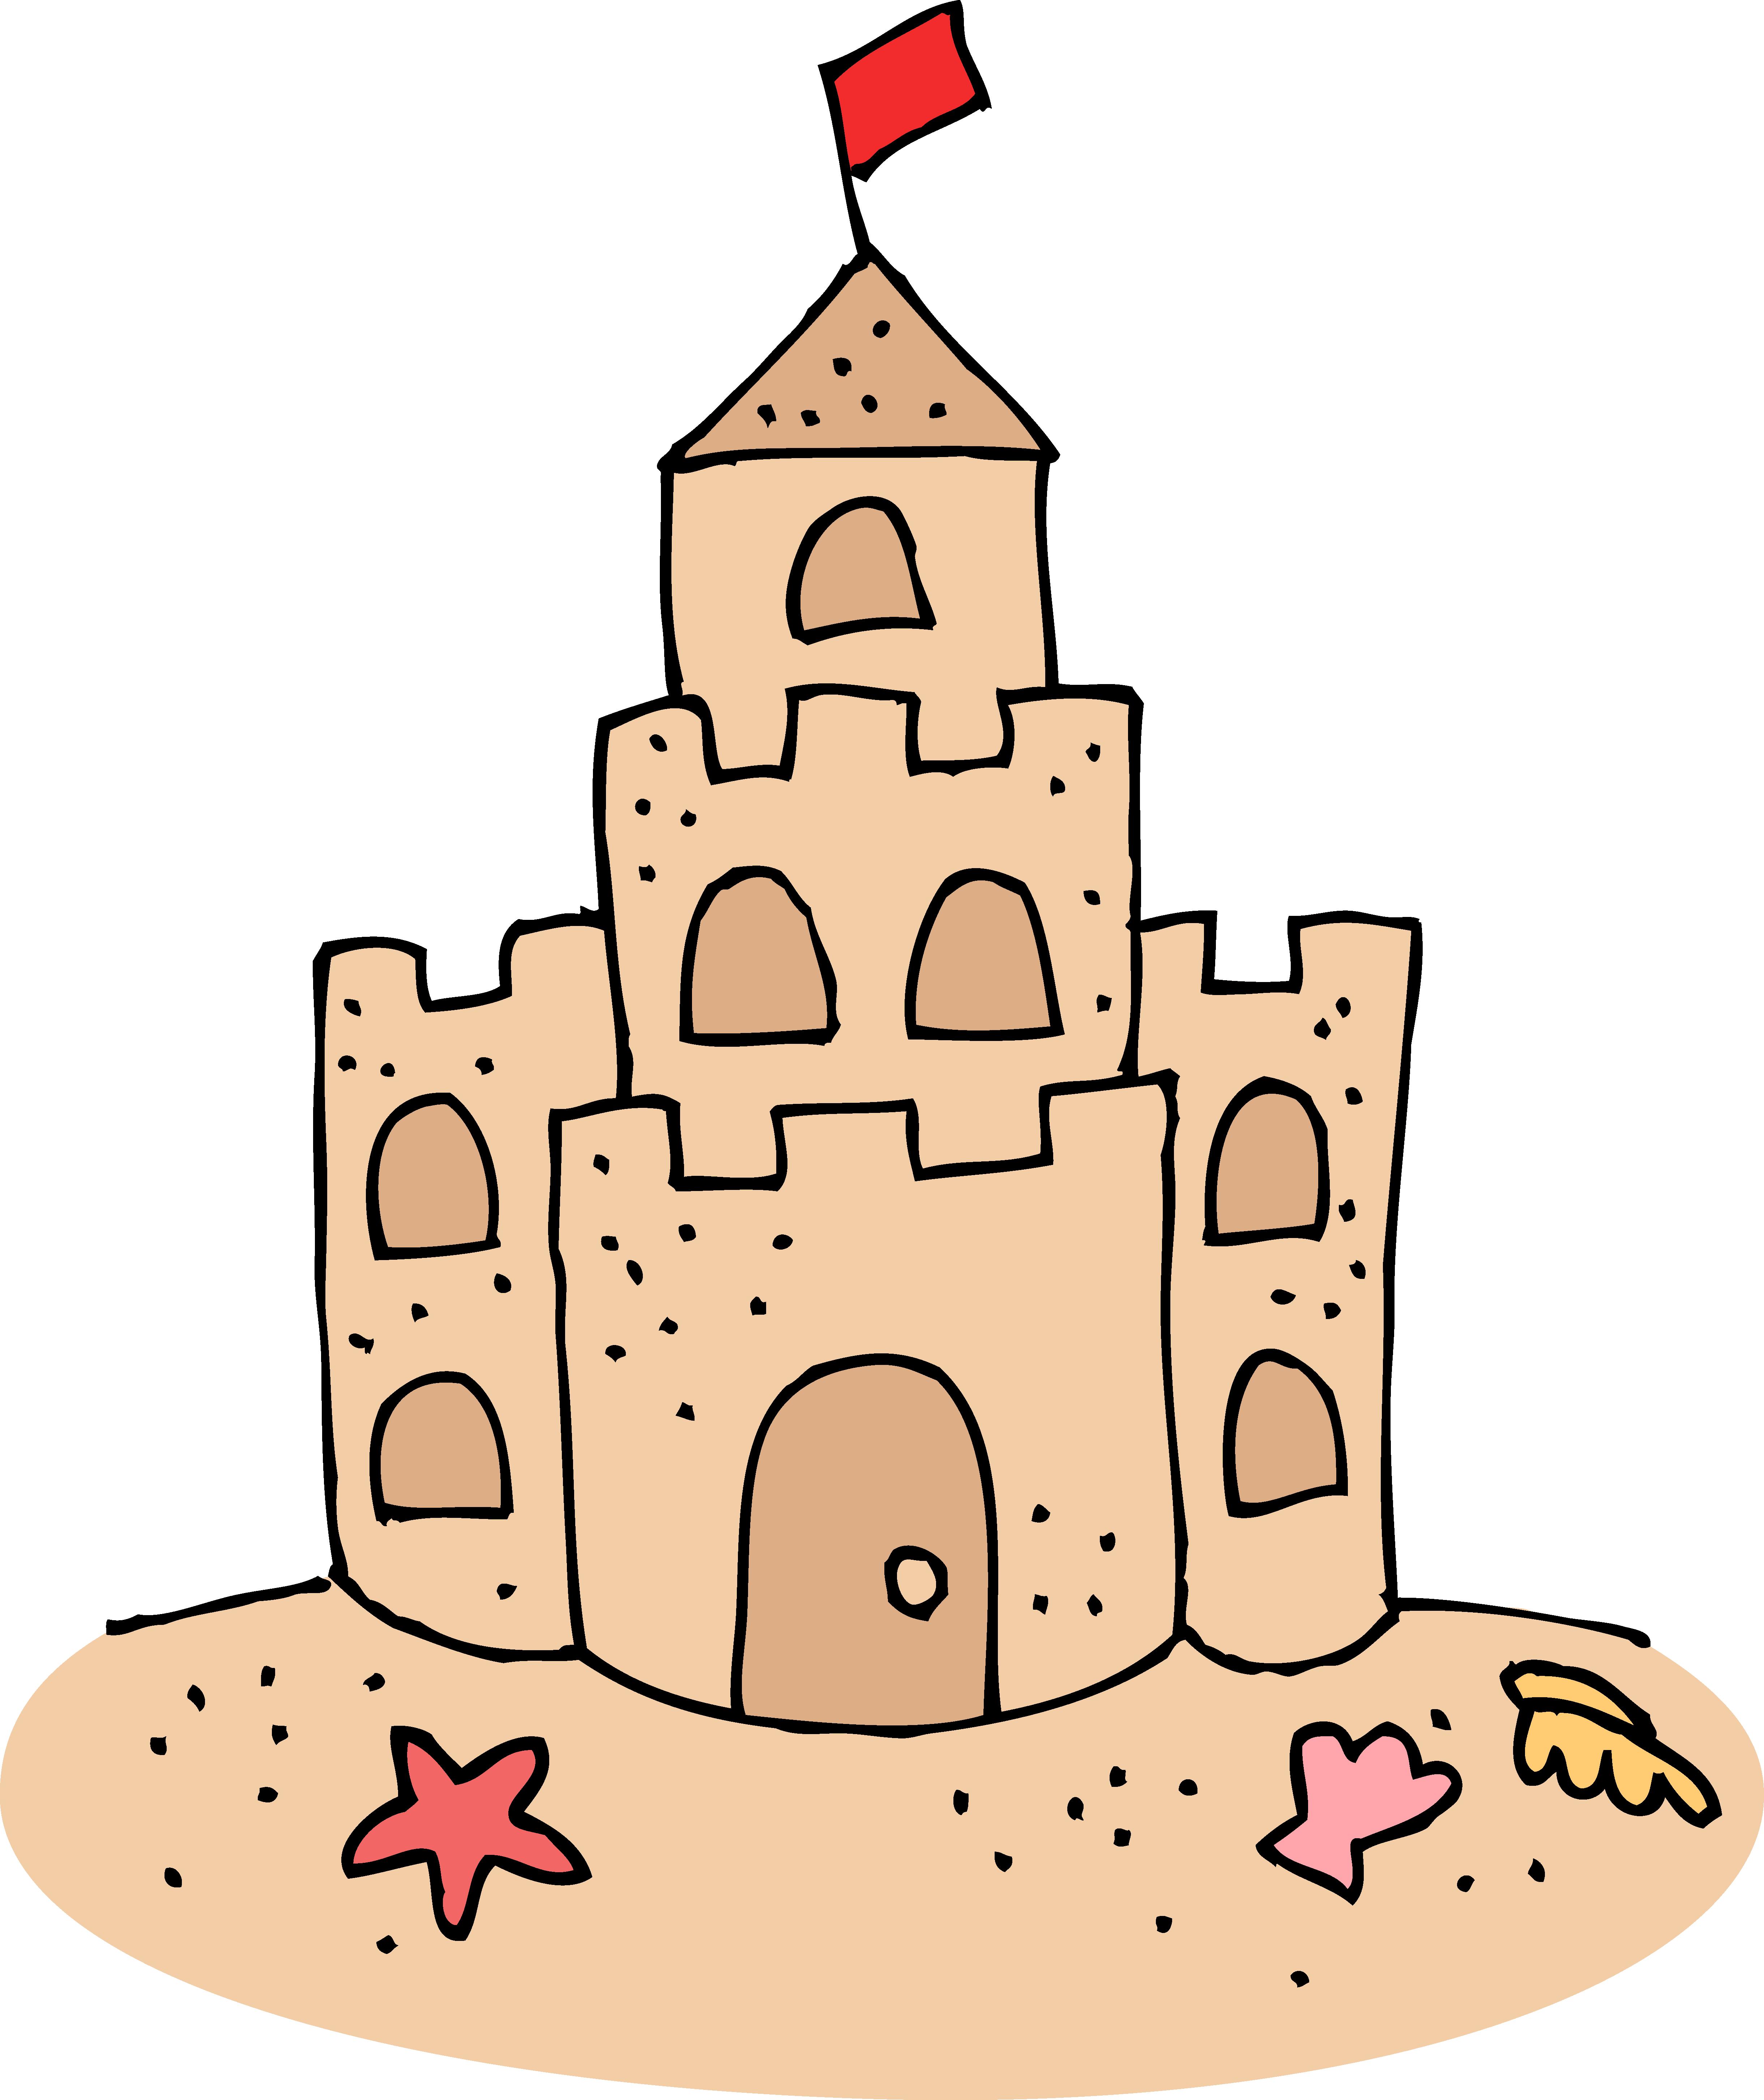 4879x5808 Cute Sand Castle Clipart